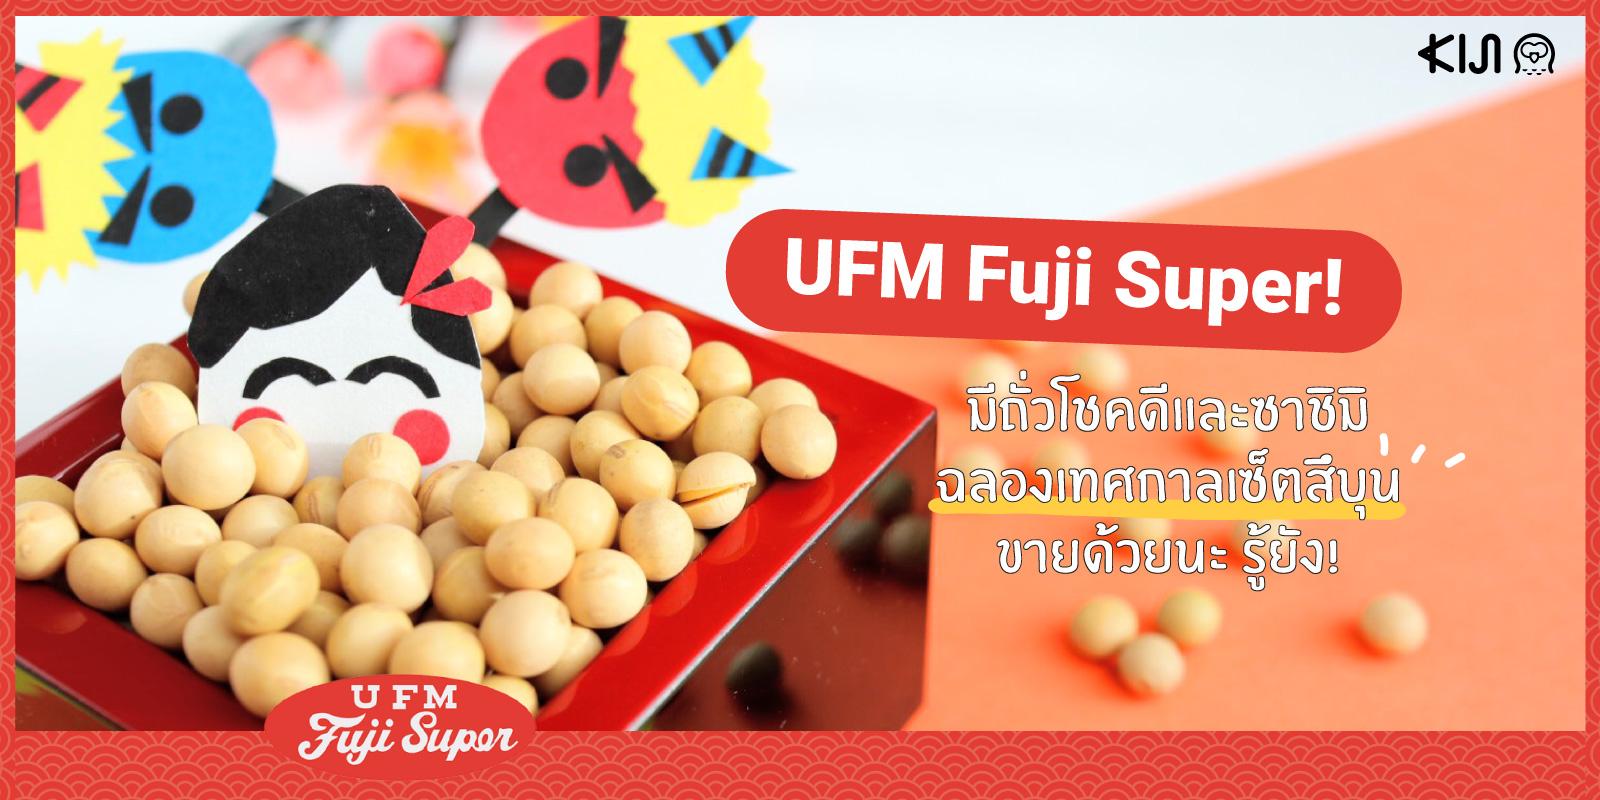 UFM Fuji Super เทศกาลเซ็ตสึบุน (節分)